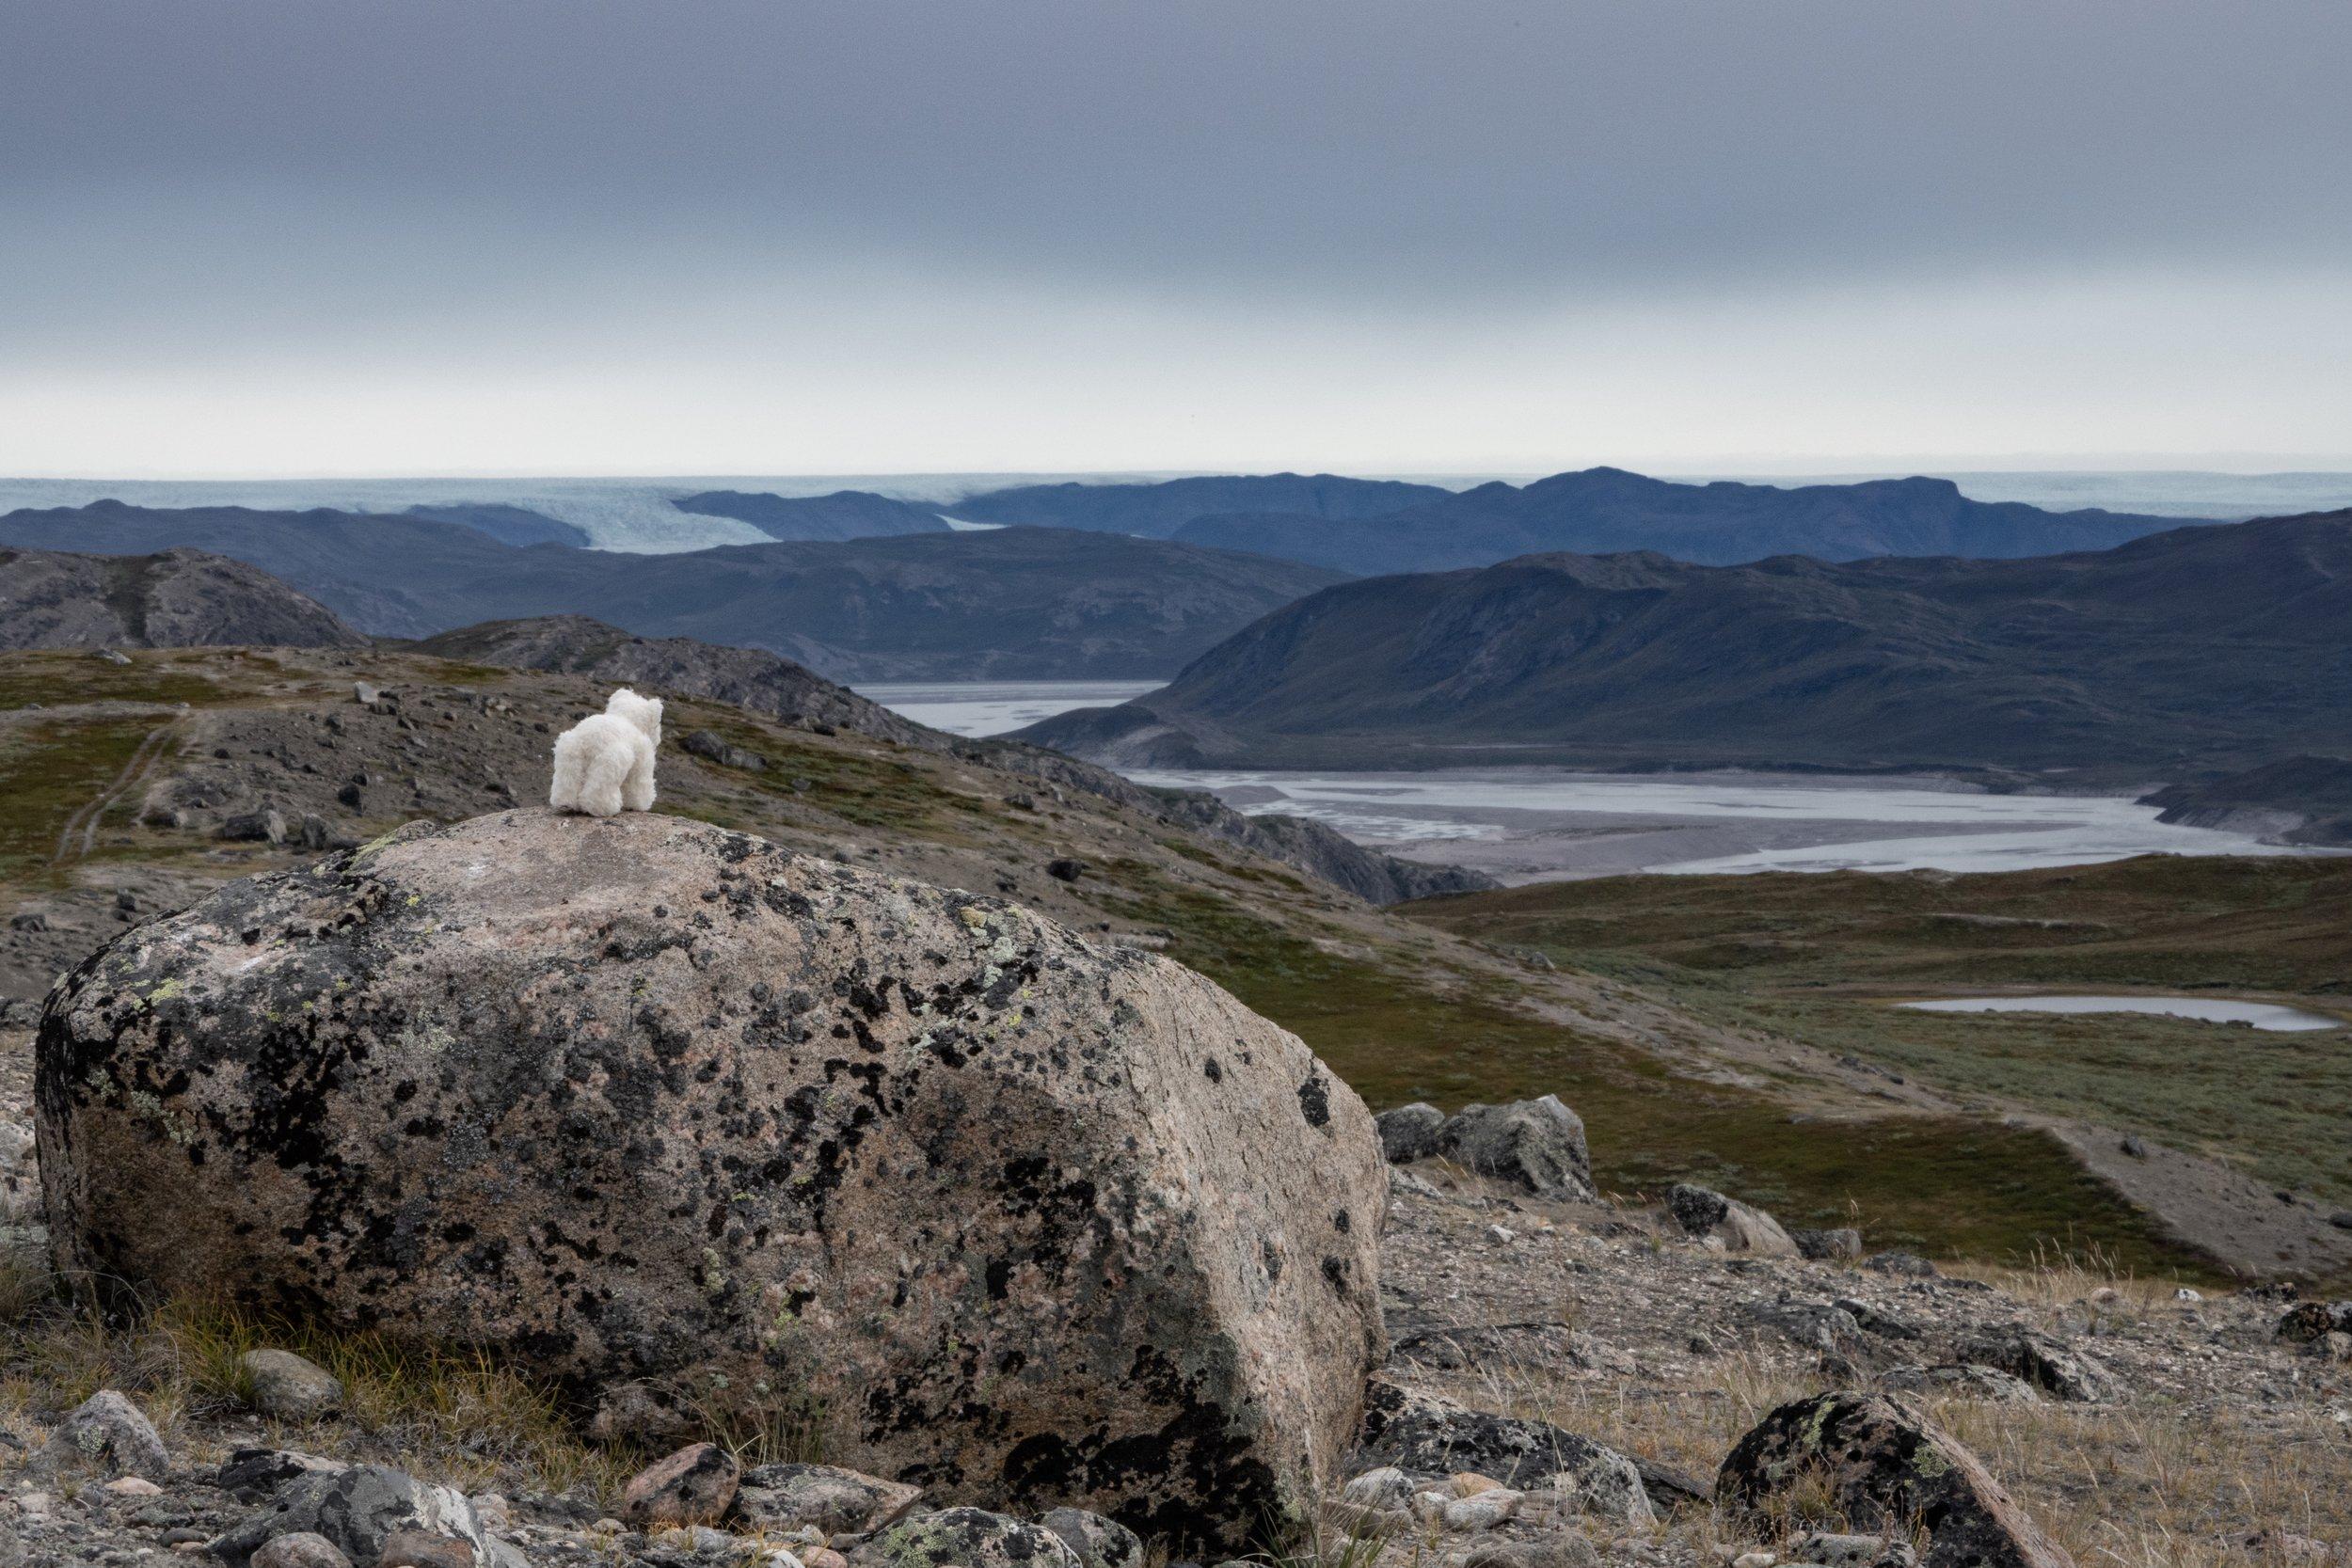 66°57'N   50°58'W ● Kangerlussuaq   Greenland